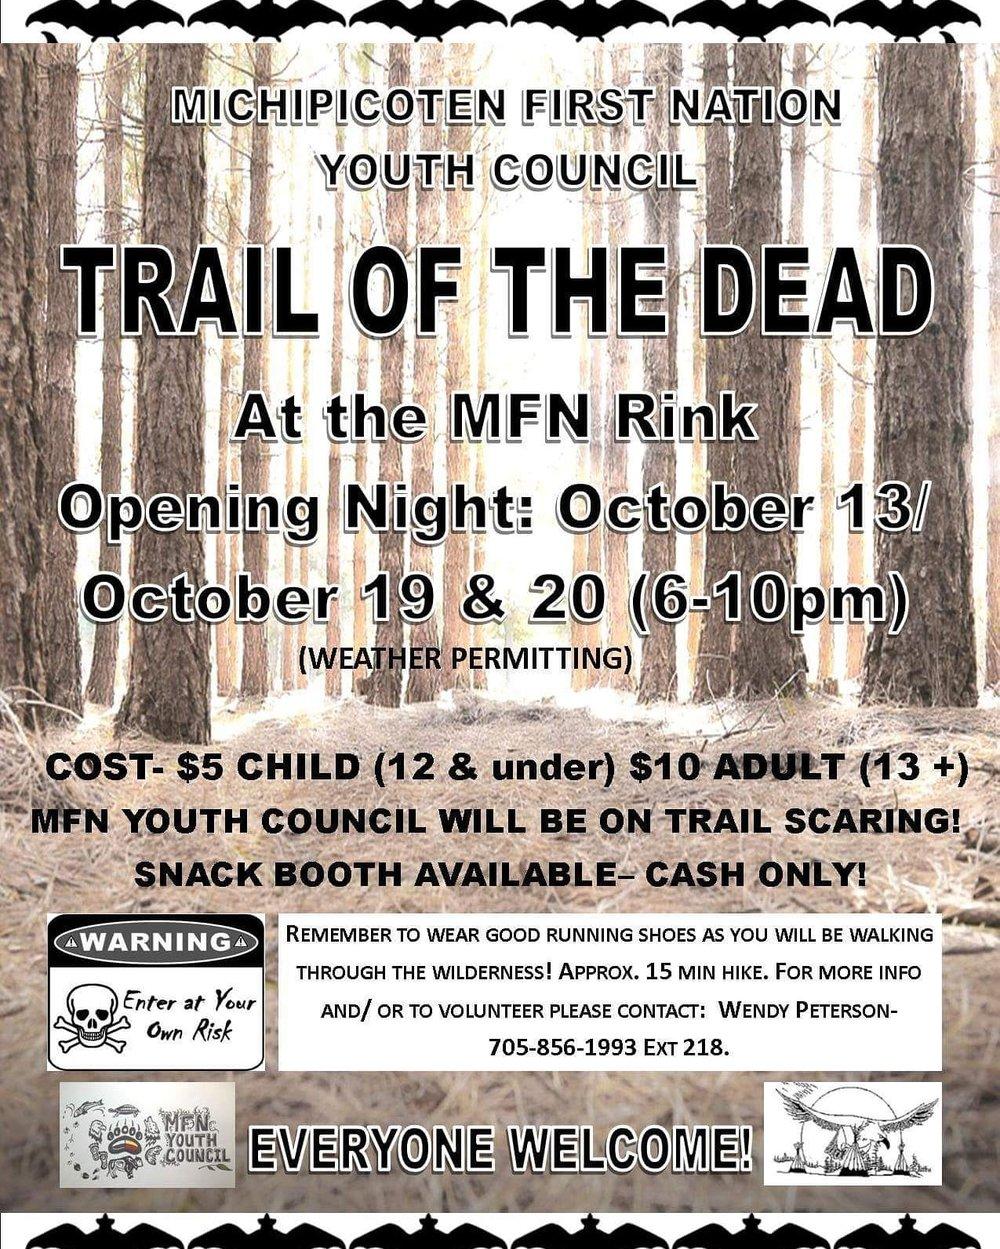 YC trail of the dead.jpg